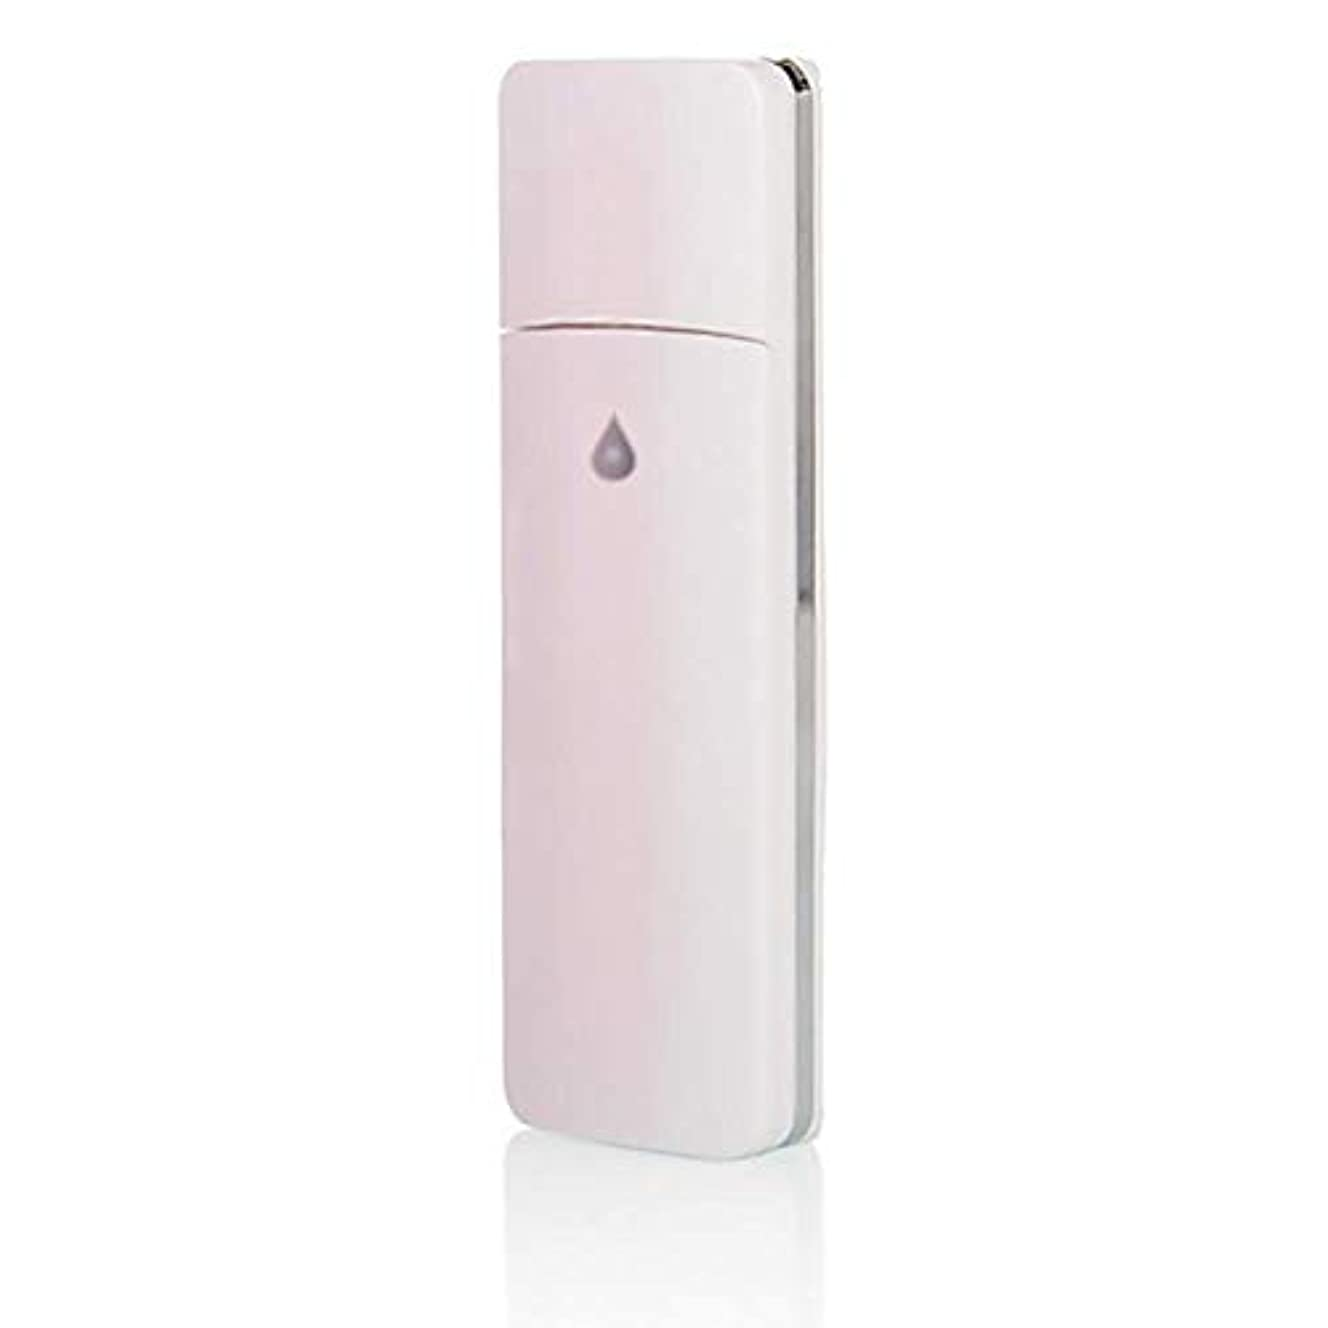 Nano Mister Handy Moisturizing Mist Sprayer、USB Rechargeable Facial Sprayer with Portable Facial Atomization、Nano...